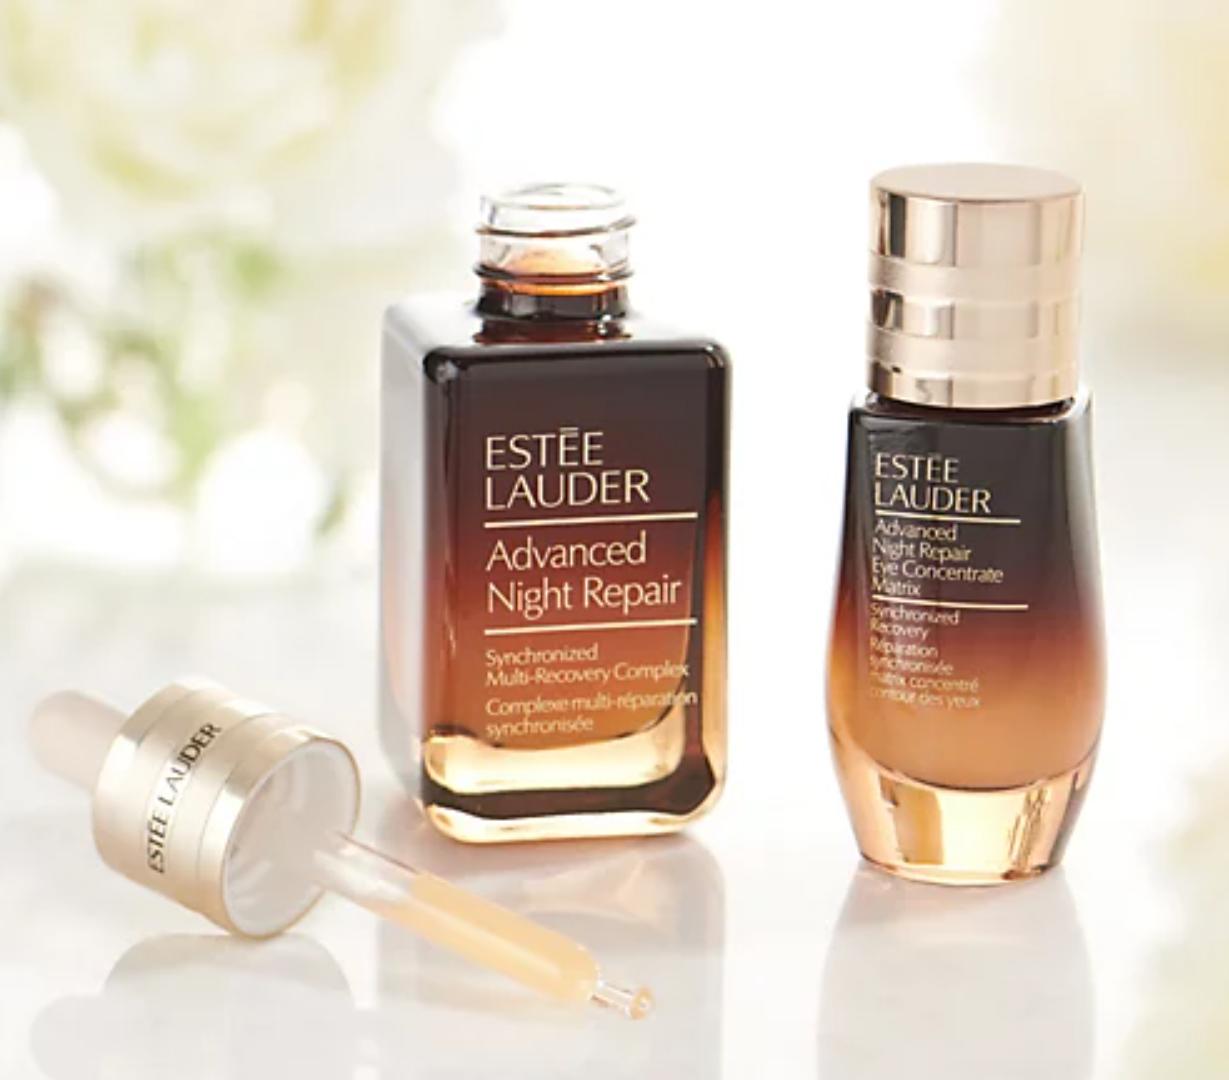 Estee Lauder Advanced Night Repair Face & Eye Serum 2-pc Set only $90 @QVC